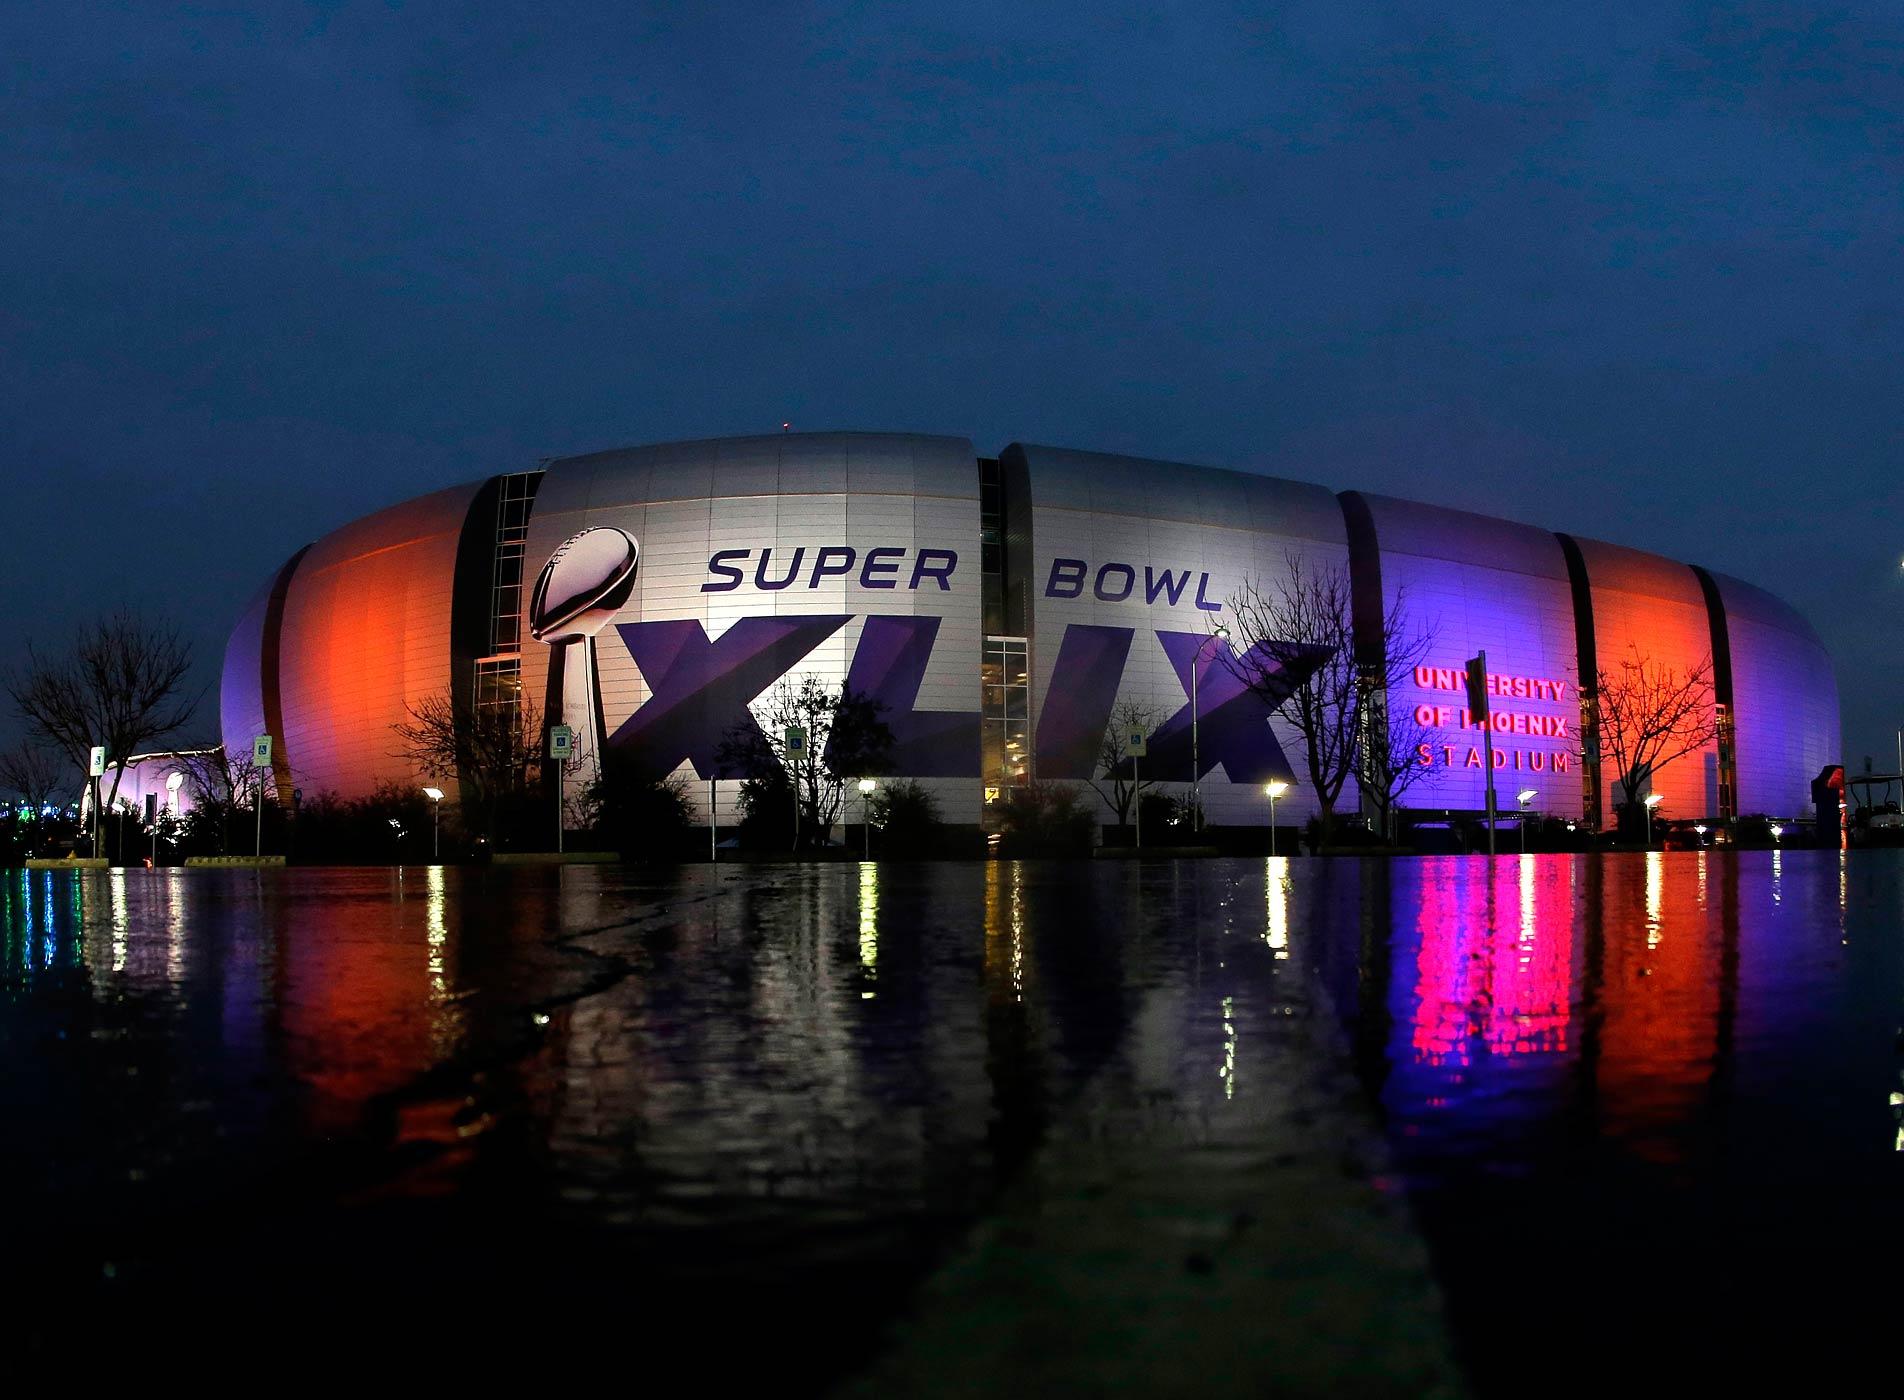 The University of Phoenix Stadium, host of Super Bowl XLIX, is seen on Jan. 29, 2015, in Glendale, Ariz.